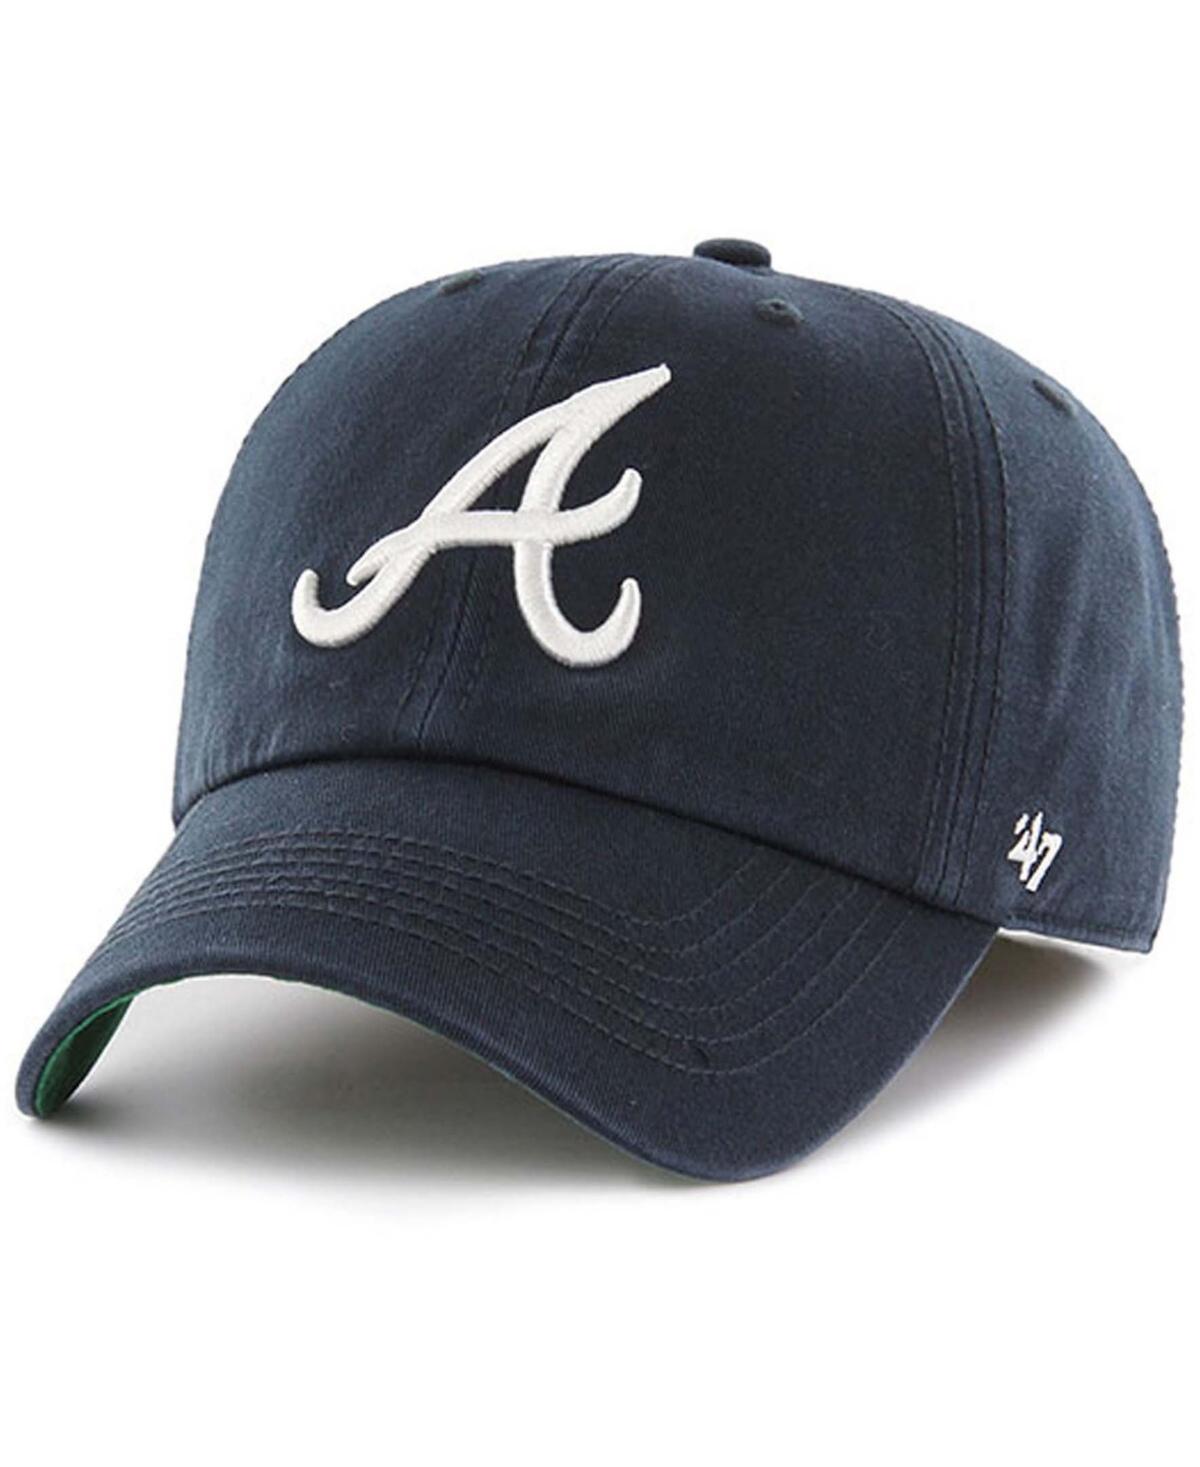 47 Brand Atlanta Braves Road Team Franchise Fitted Cap